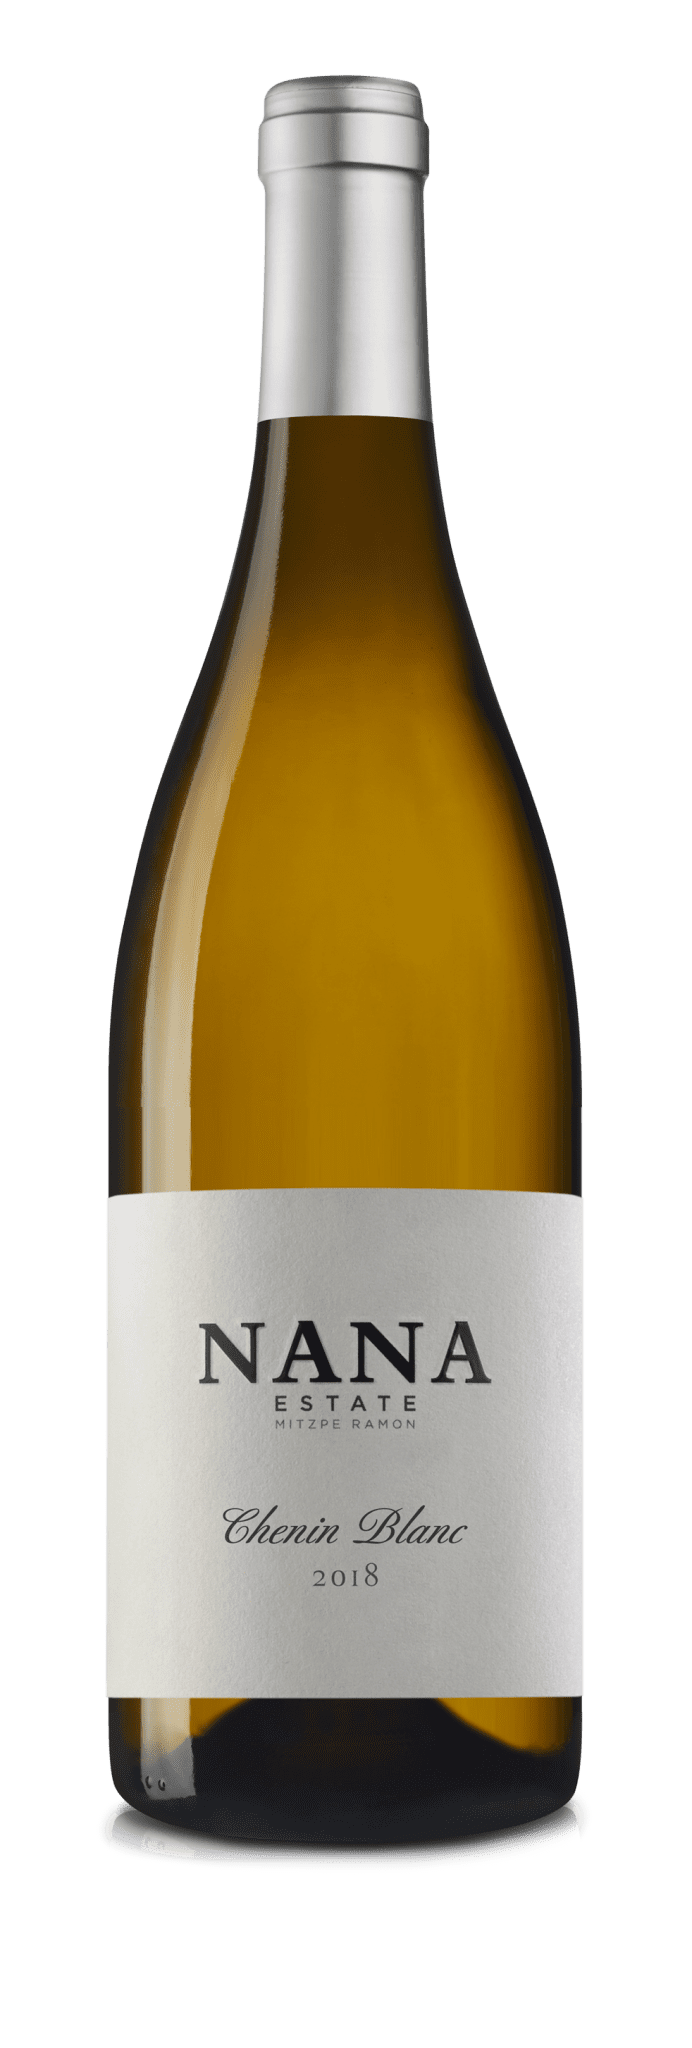 Chenin Blanc 2019 - 750ml